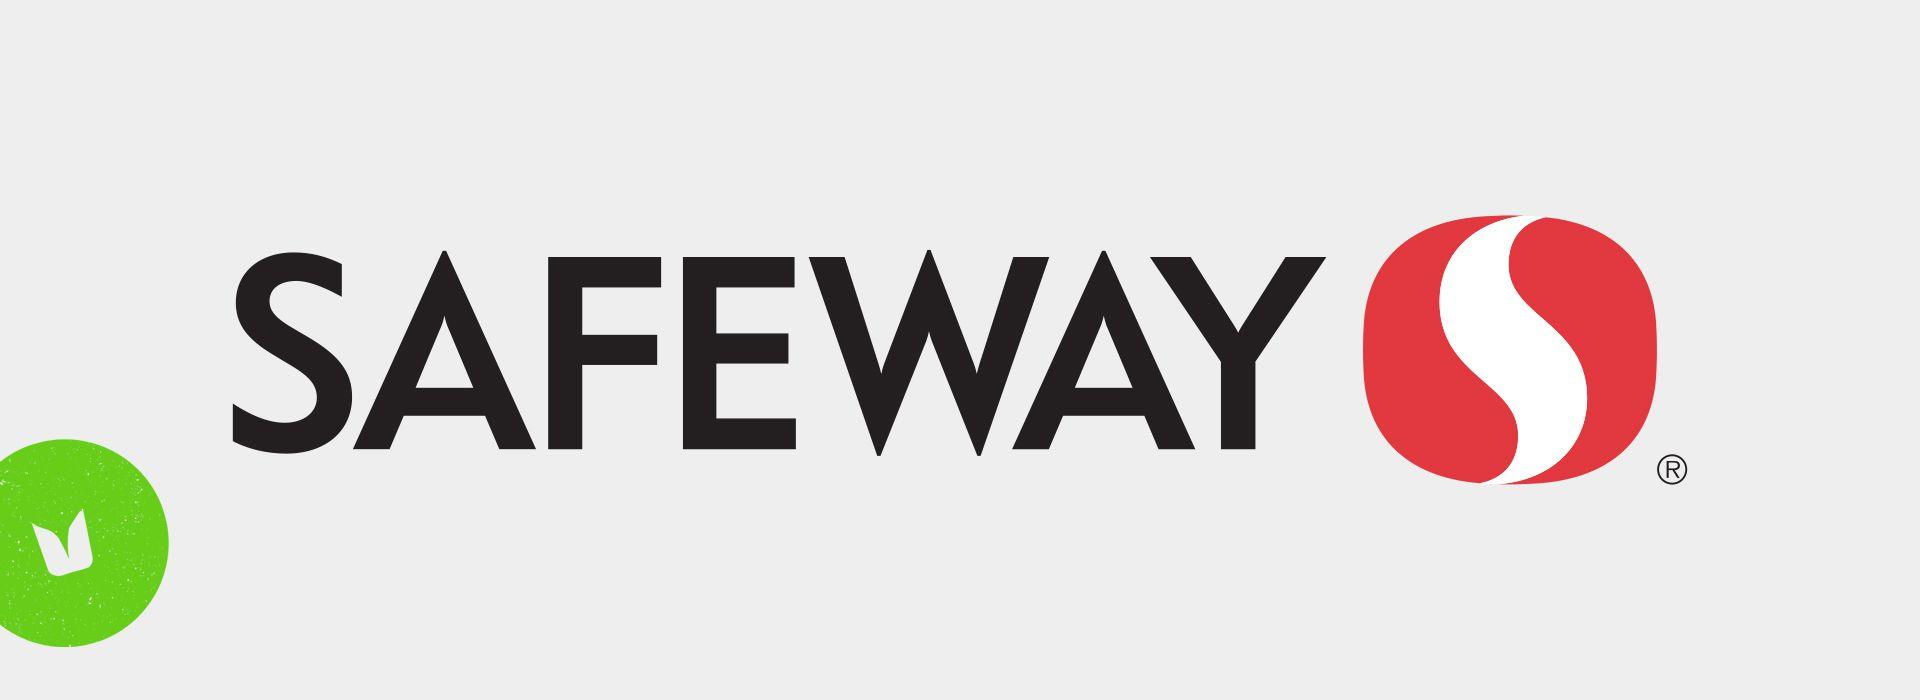 $50 Safeway Gift Cards